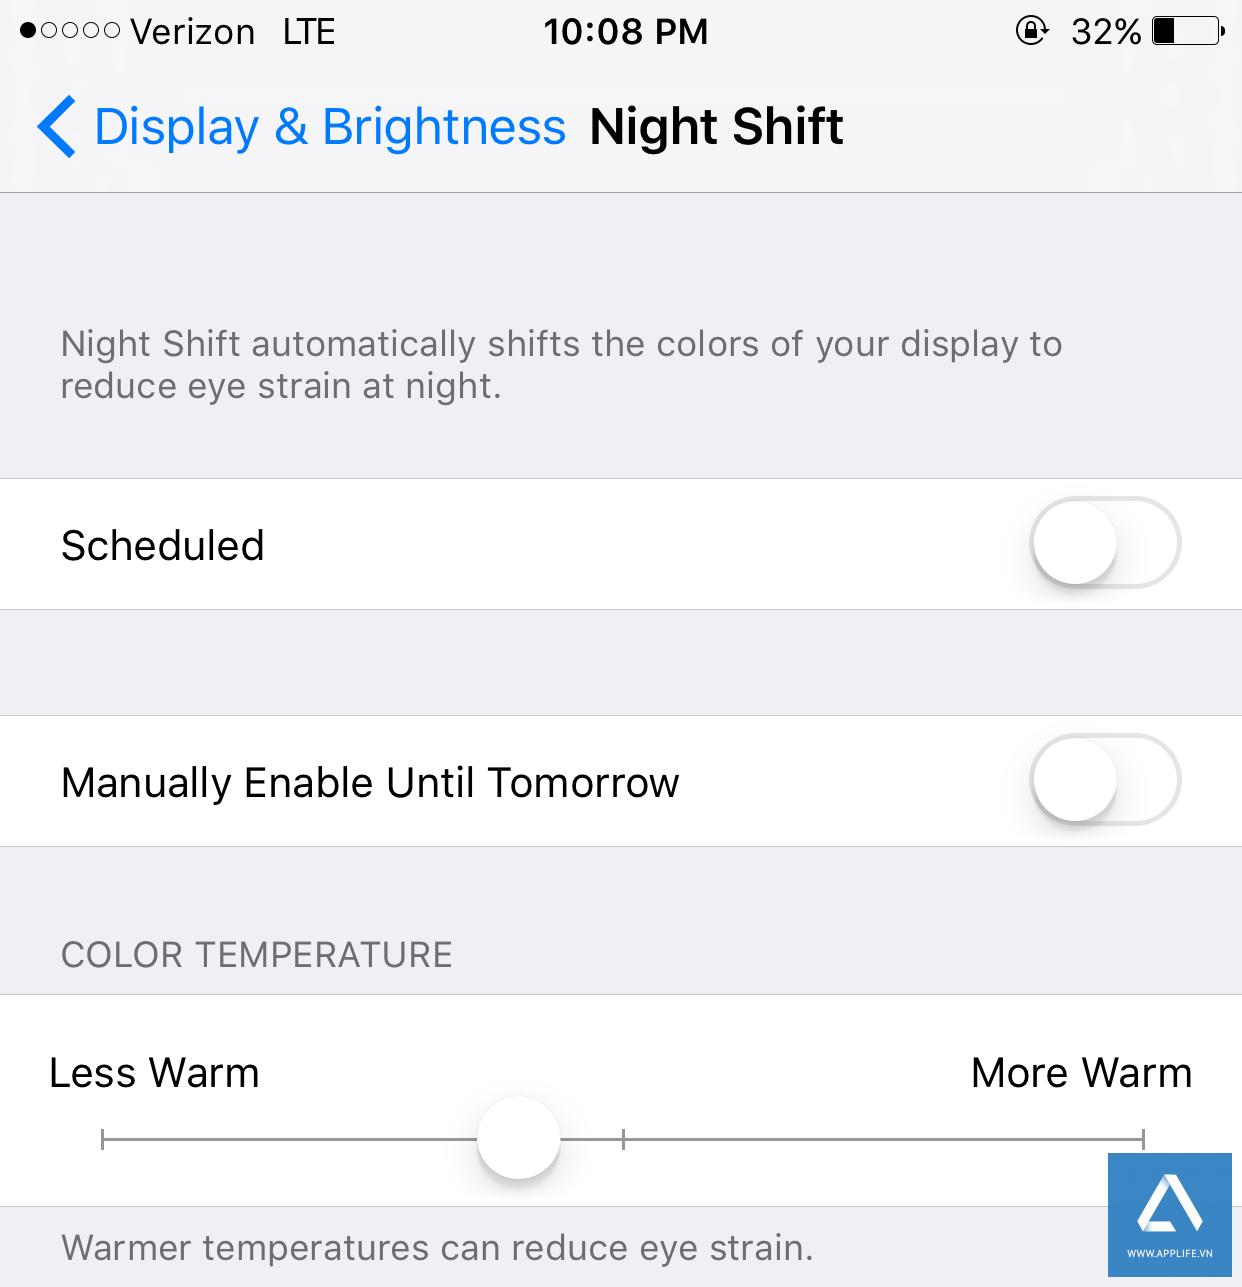 iOS-9.3-beta-5-Night-Shift-mode-enable-until-tomorrow